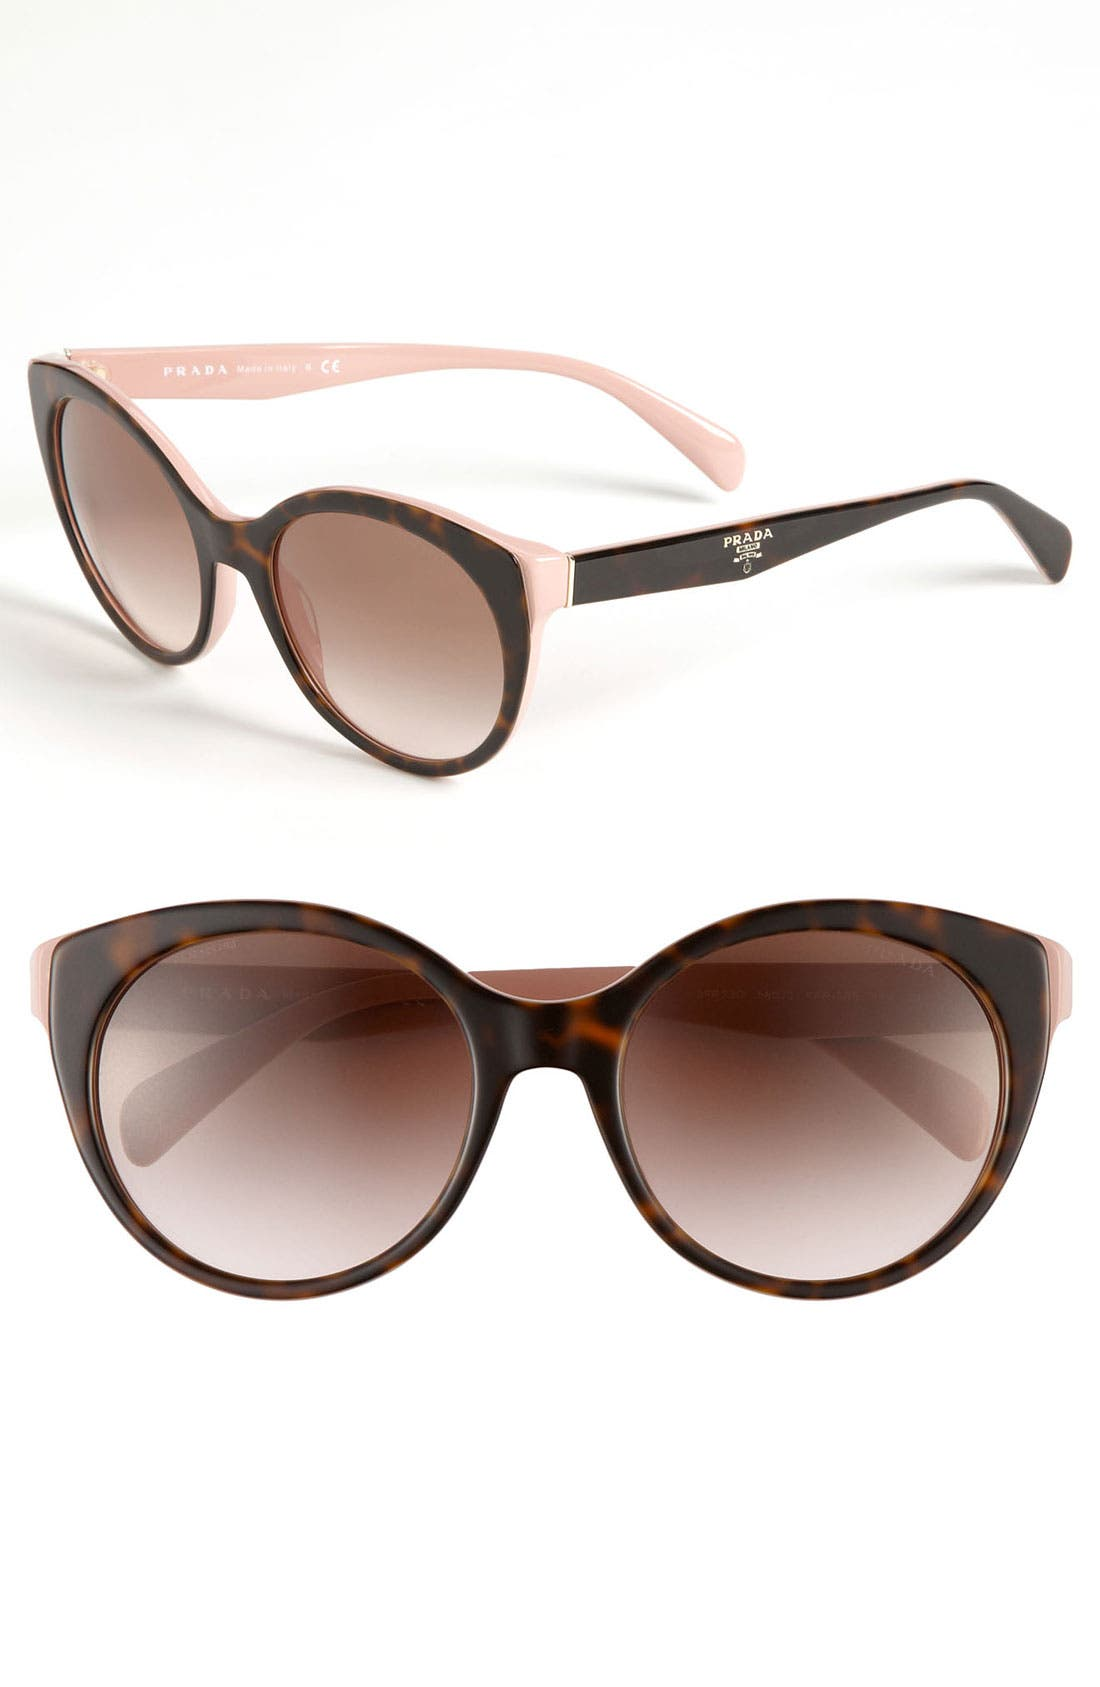 Main Image - Prada 56mm Cat Eye Sunglasses